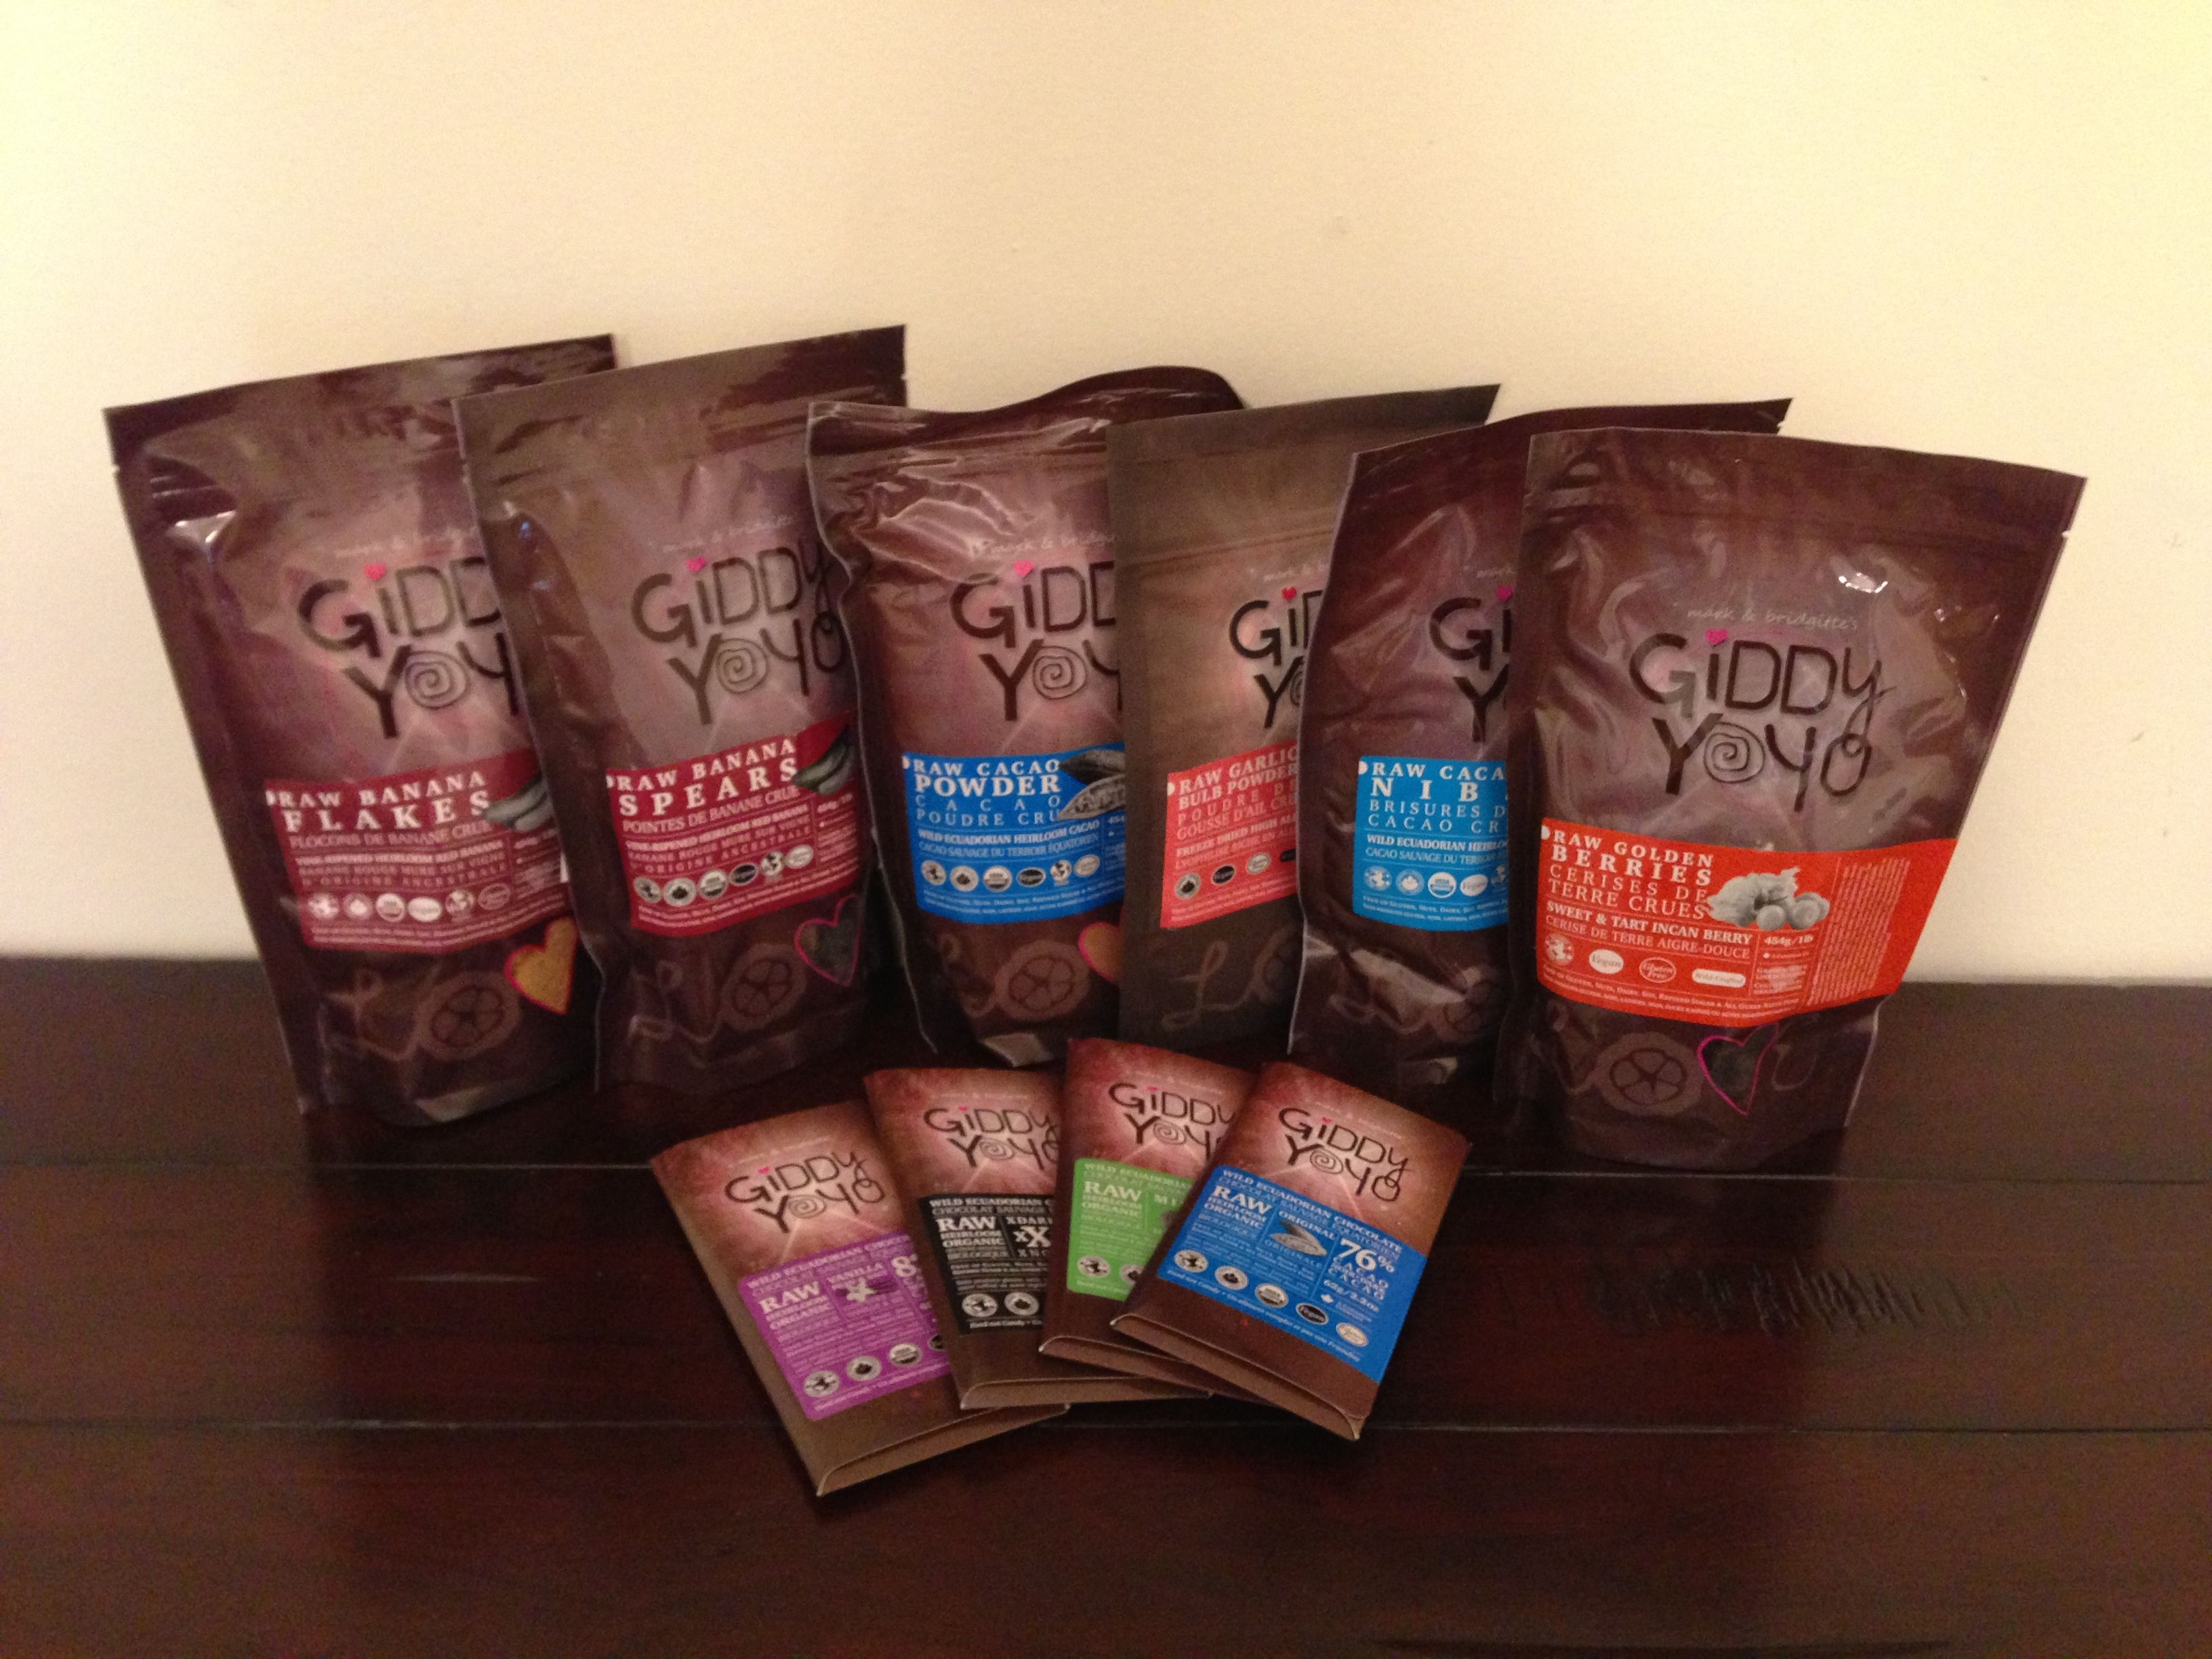 Giddy Yoyo Organic Chocolates and snacks